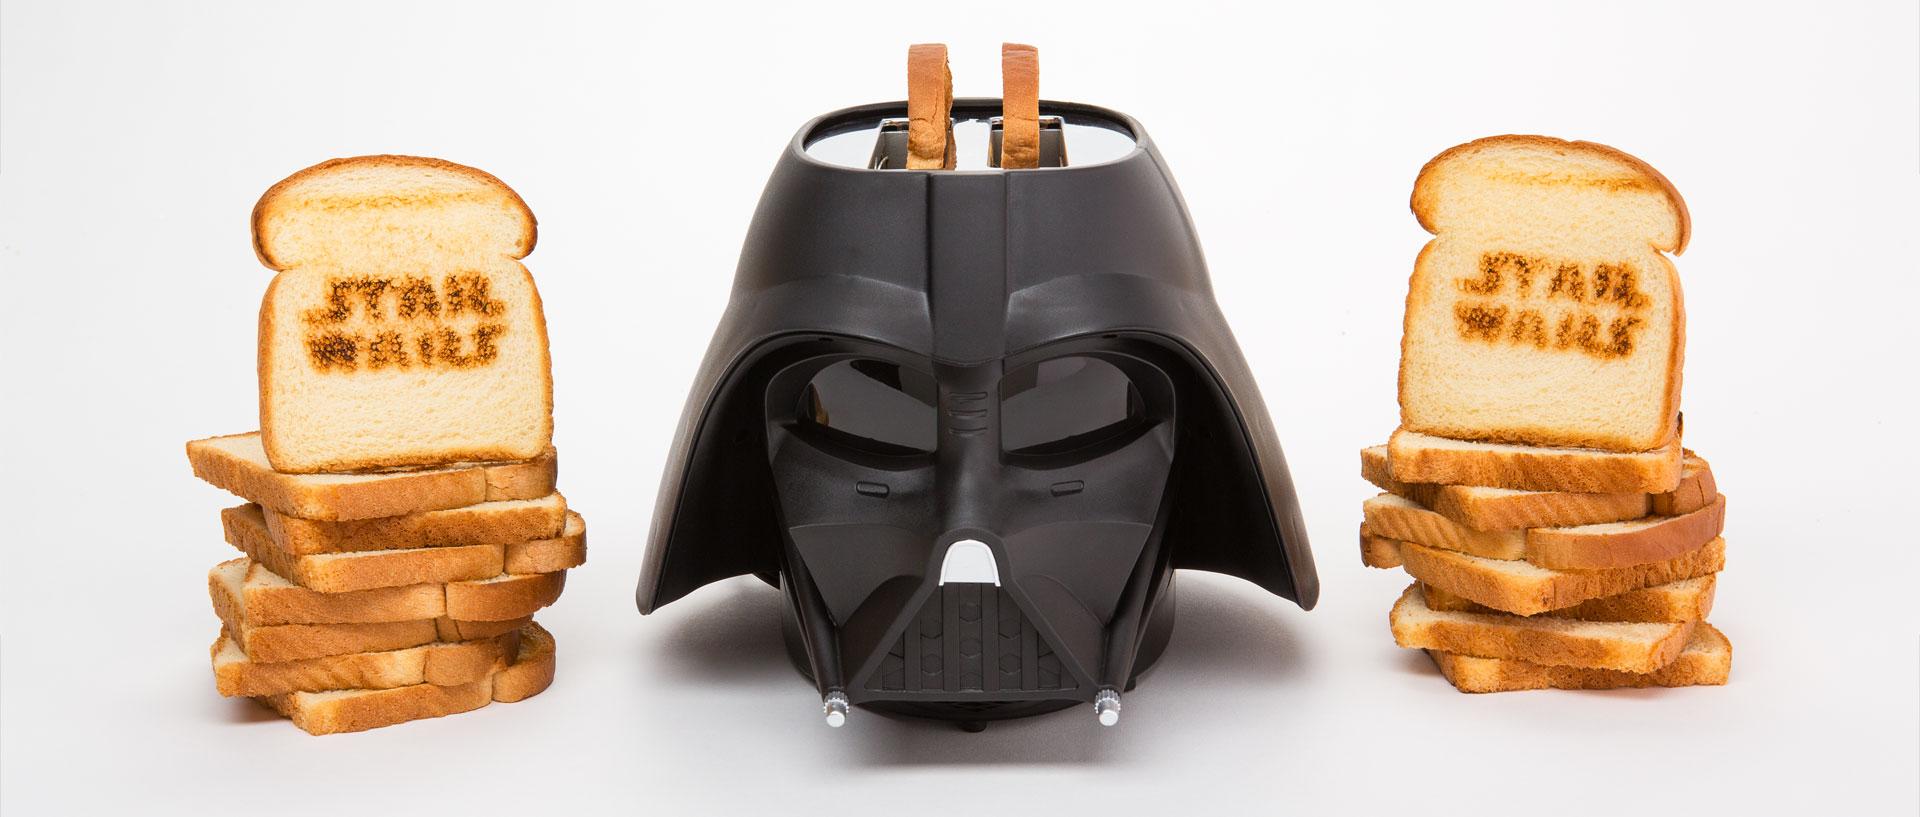 Darth Vader Toaster Makes Toast On The Dark Side